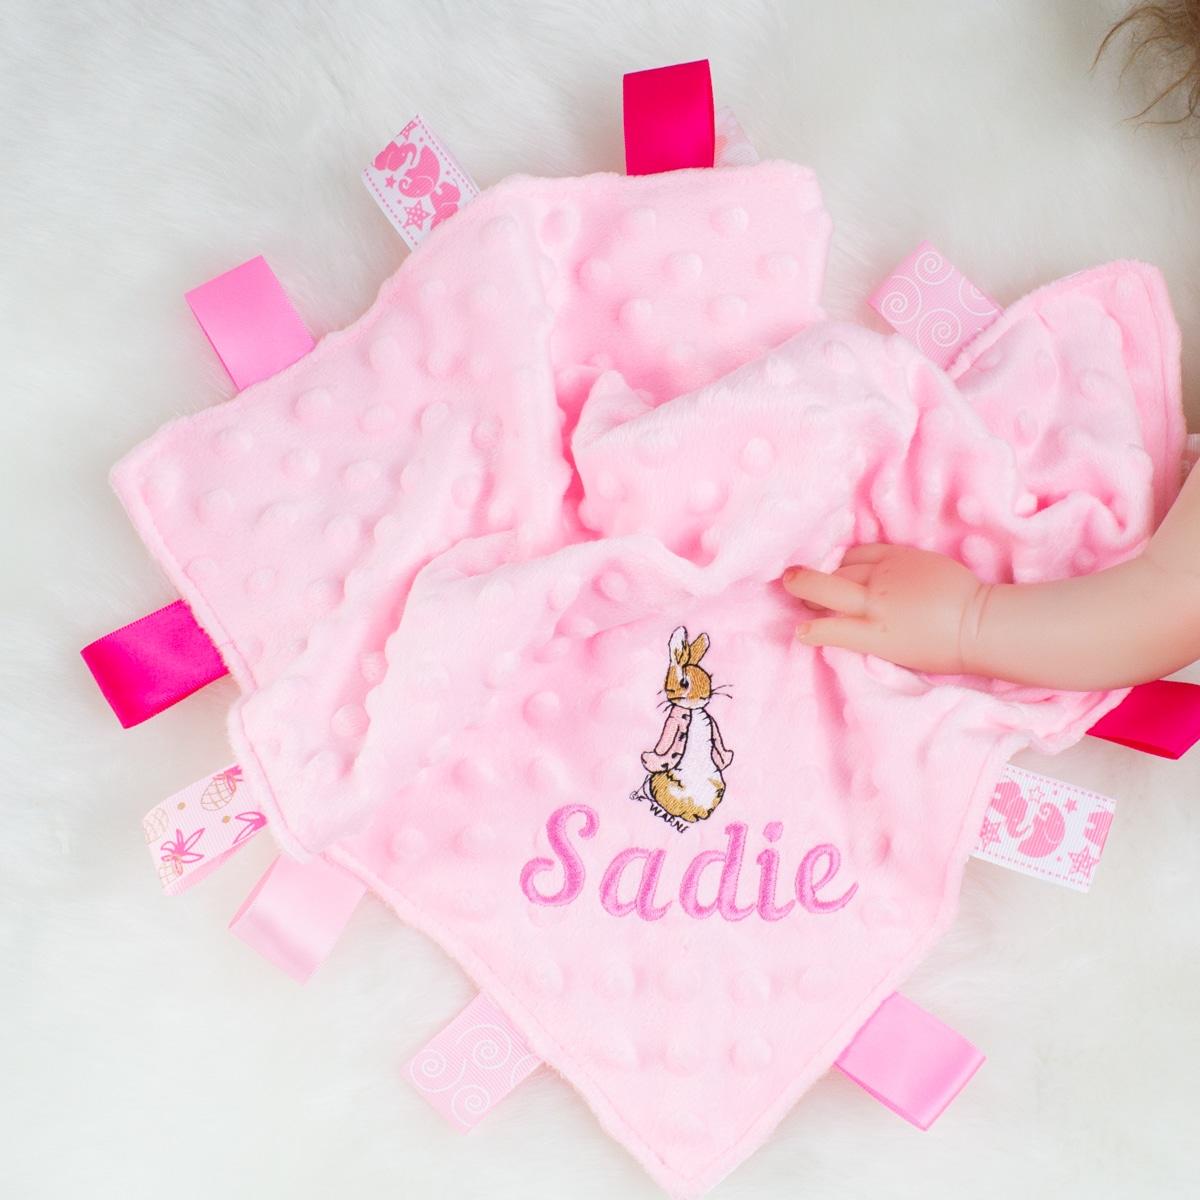 Personalised Peter Rabbit Baby Comforter